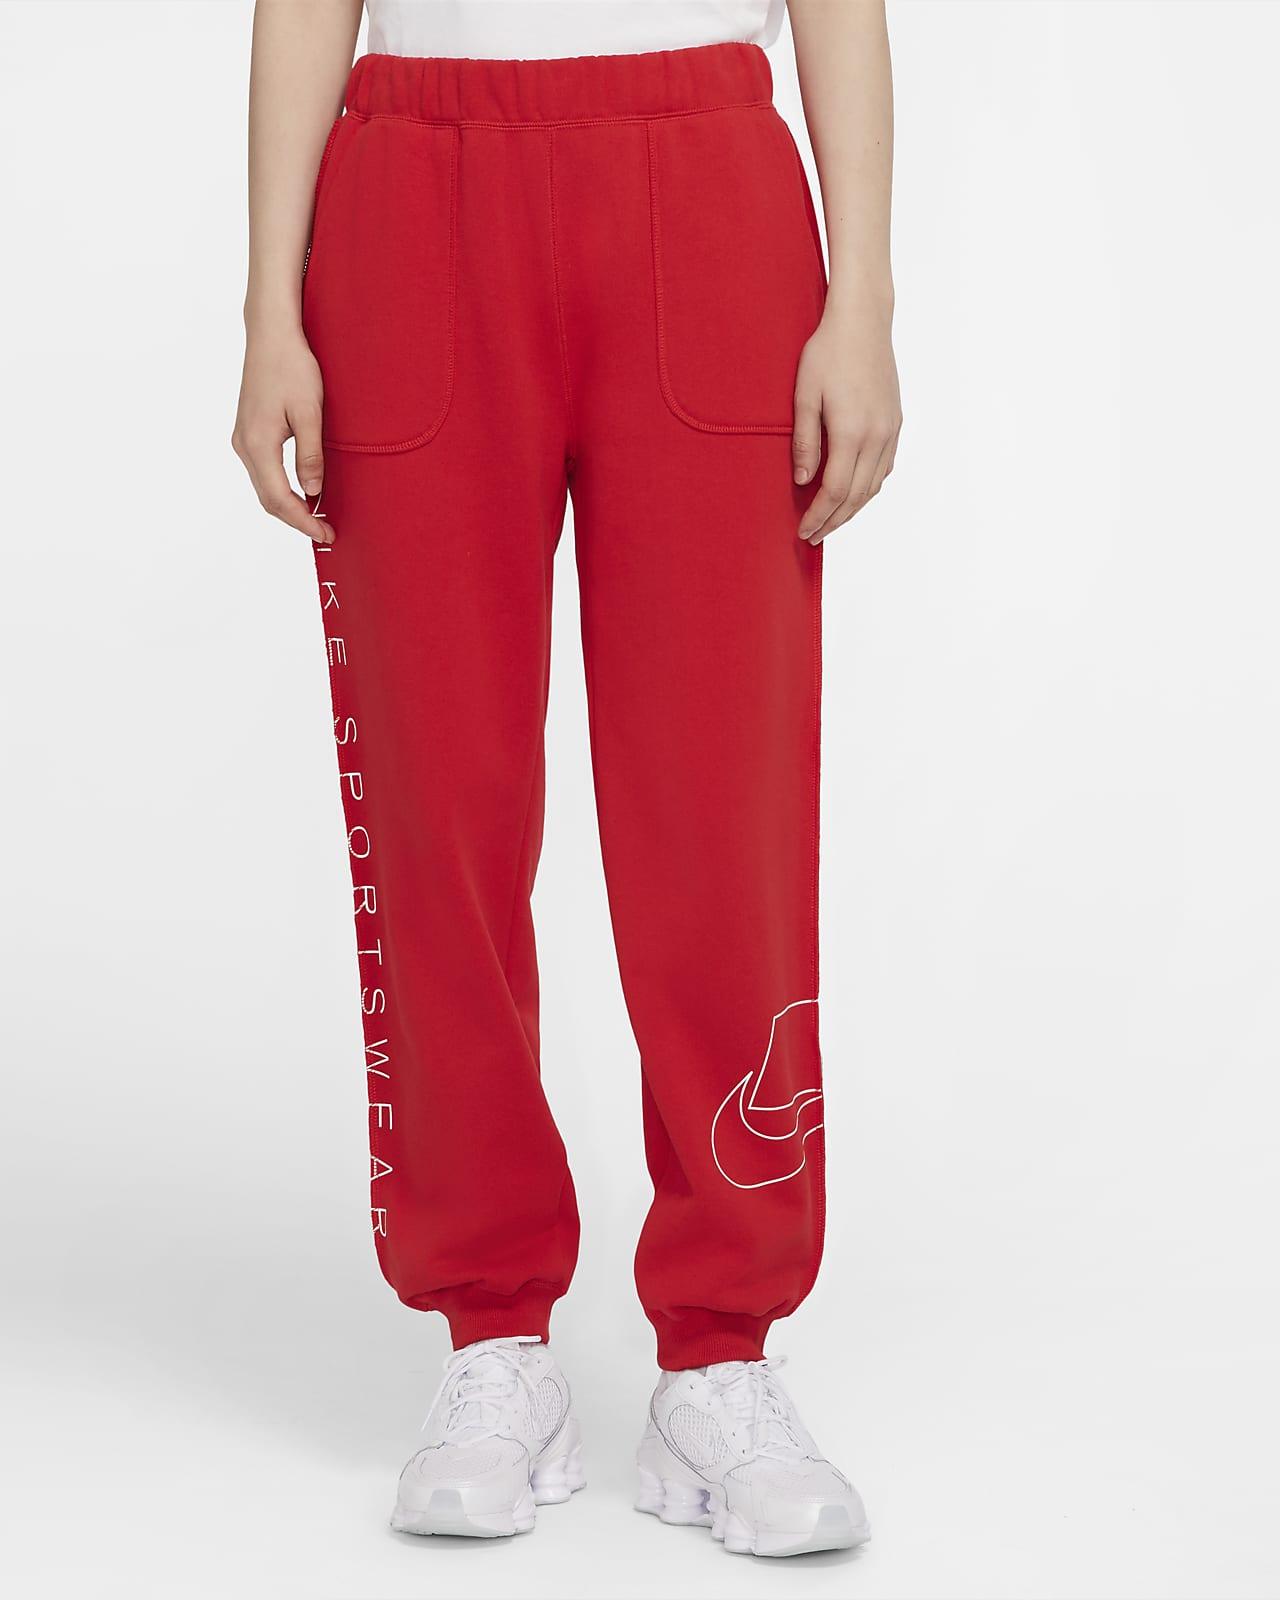 Nike Sportswear NSW Pantalons de teixit Fleece - Dona